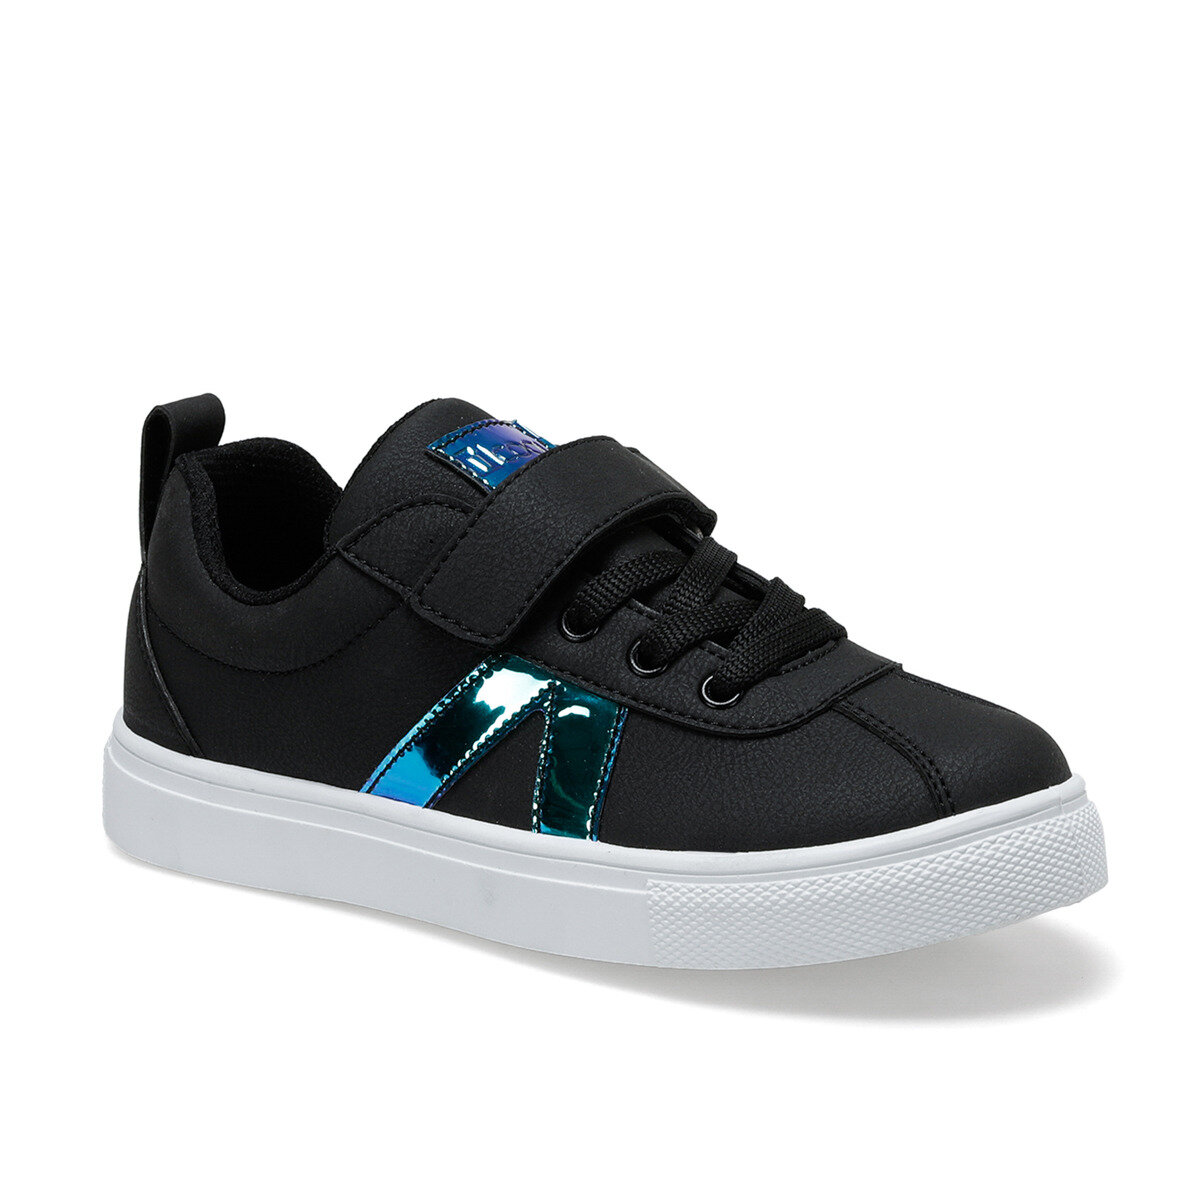 FLO VERDE Black Female Child Sneaker Shoes I-Cool